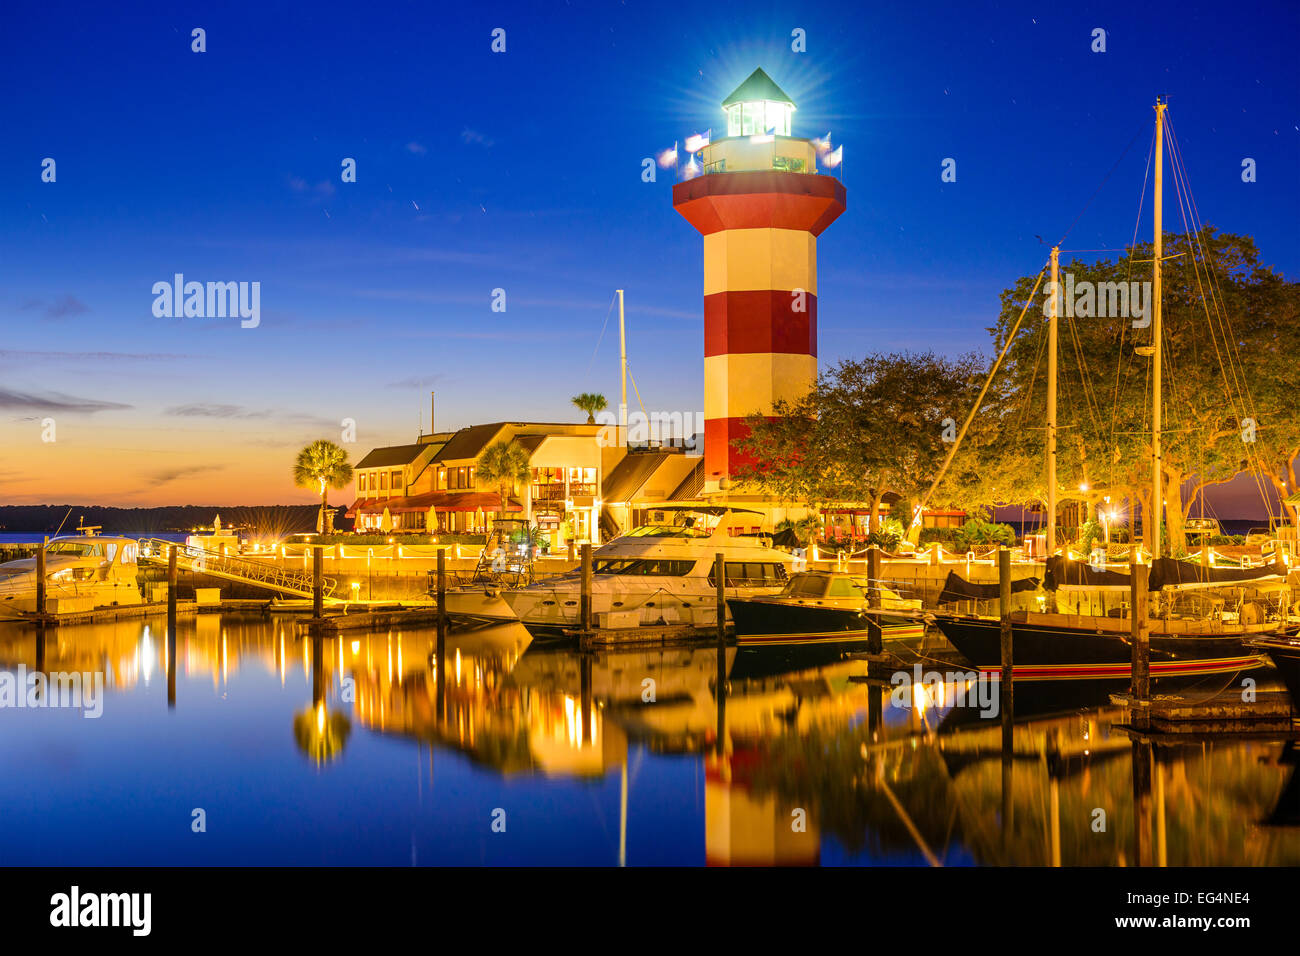 Hilton Head, South Carolina, USA lighthouse. - Stock Image